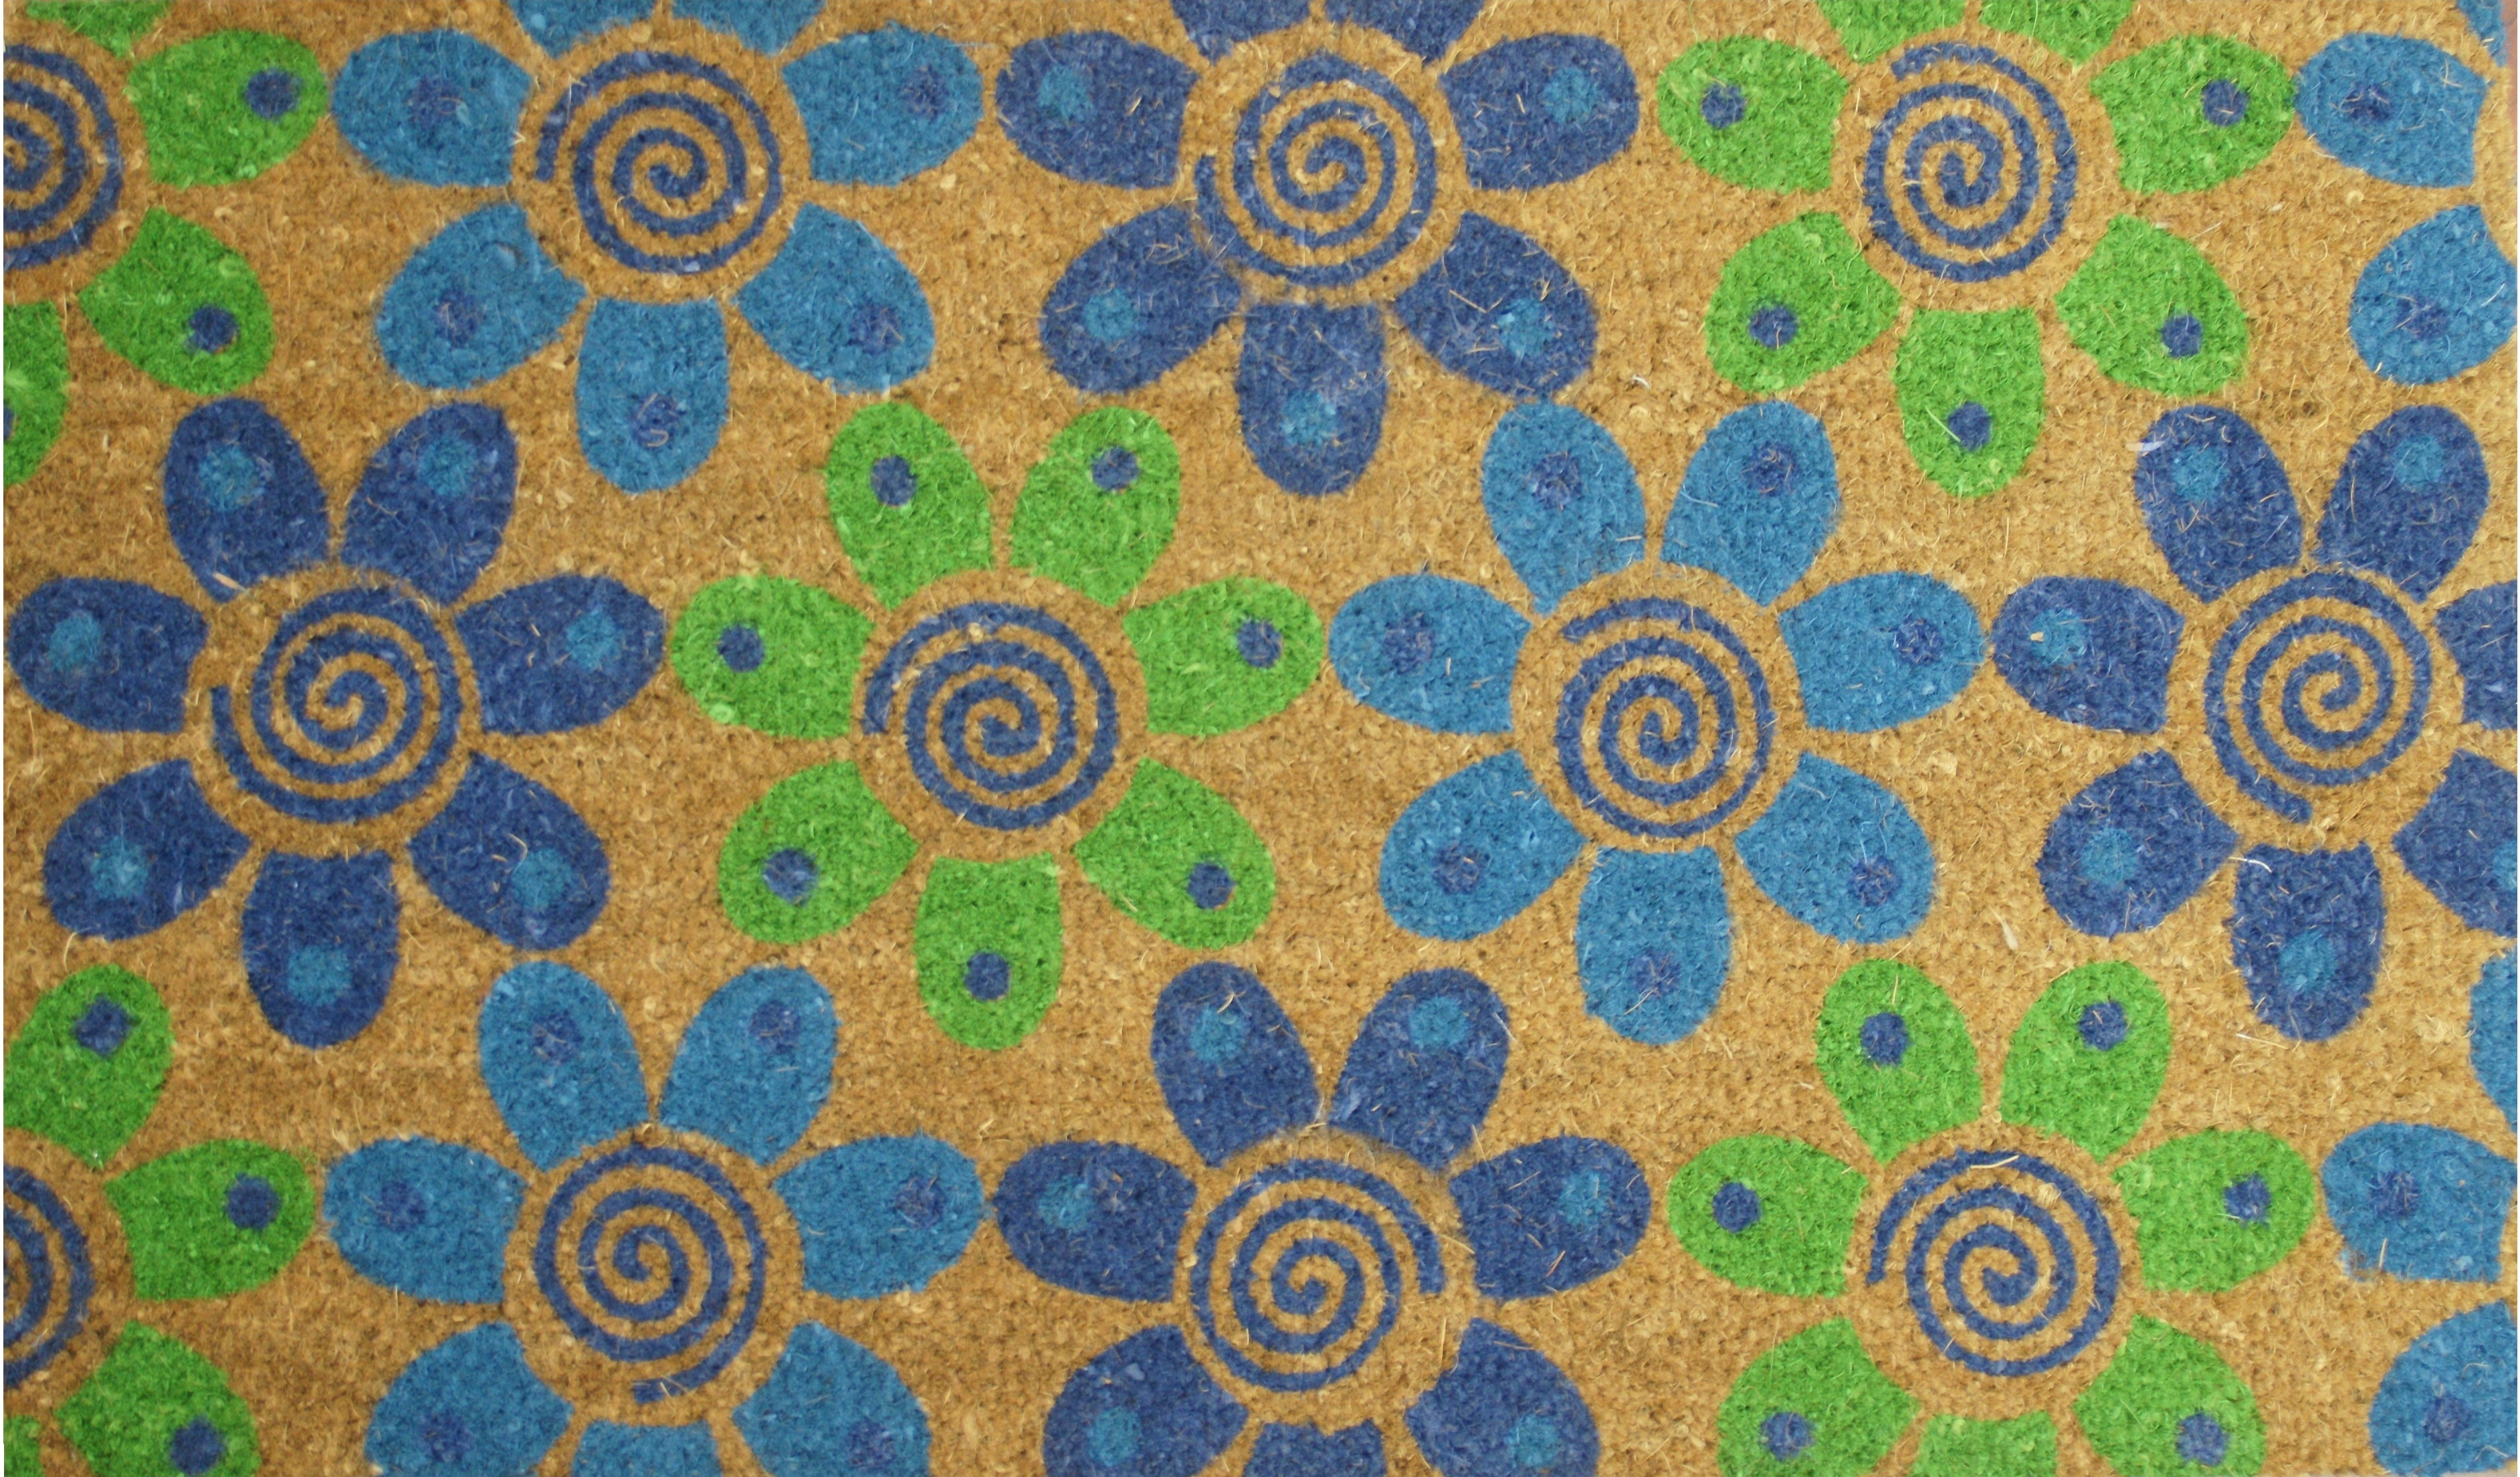 Leaf & Fiber EcoGrip EcoMats - Sustainable Doormats